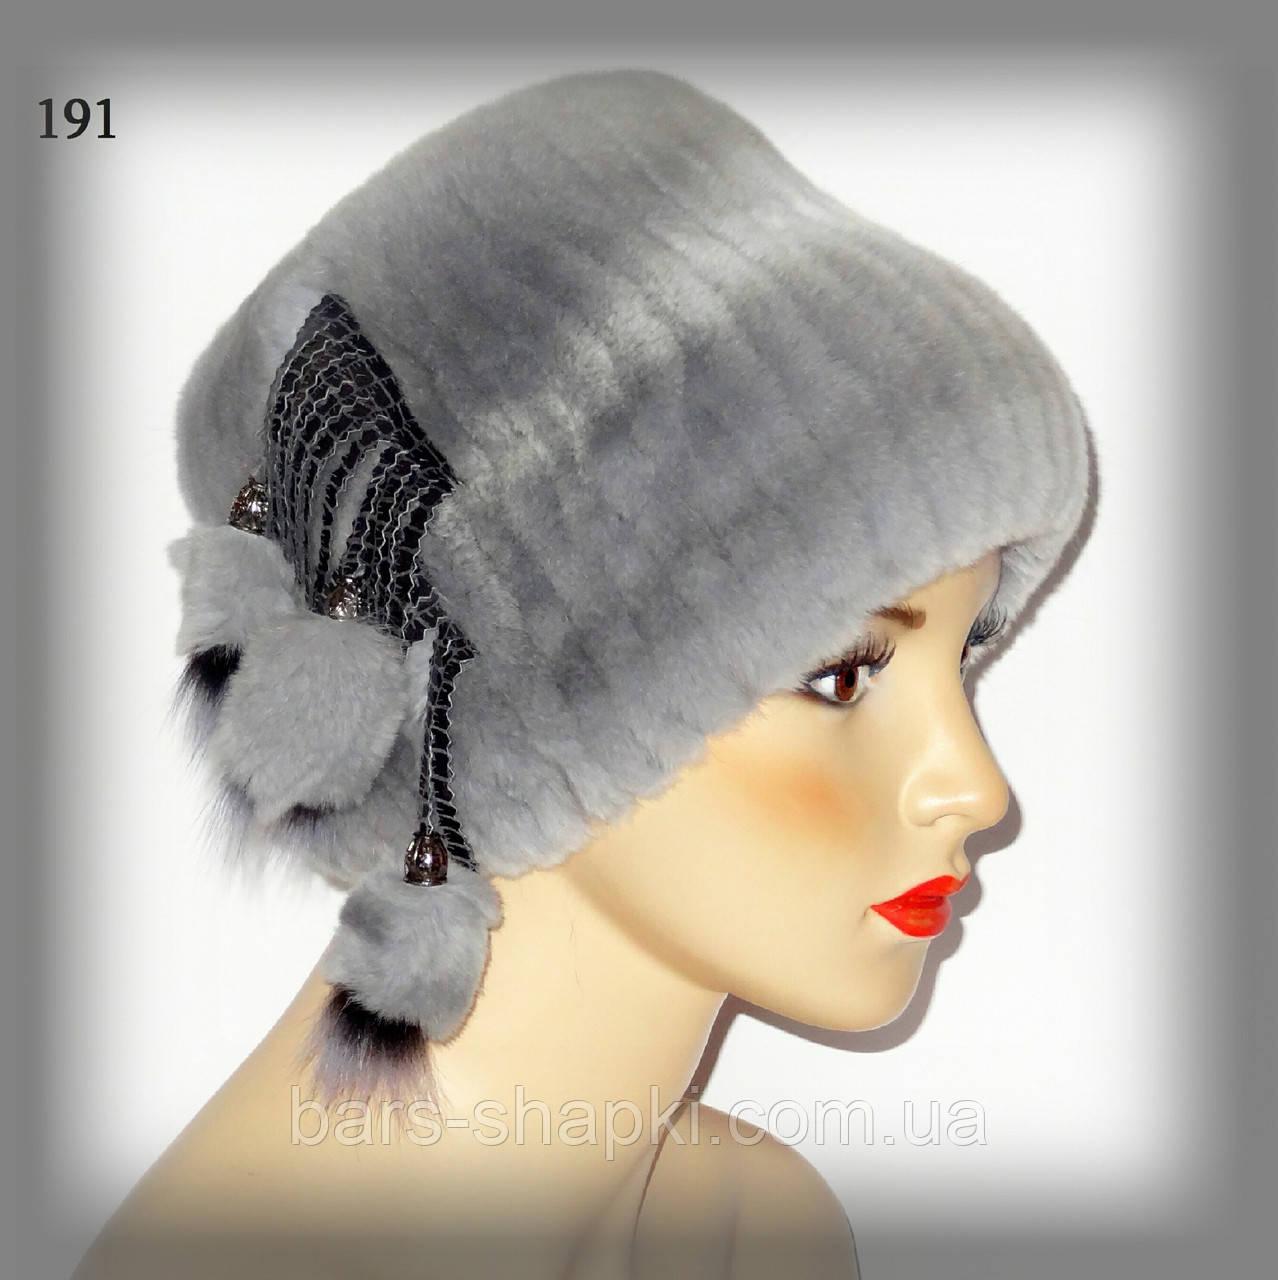 Меховая шапочка из кролика-шиншилы (кубанка голубая)